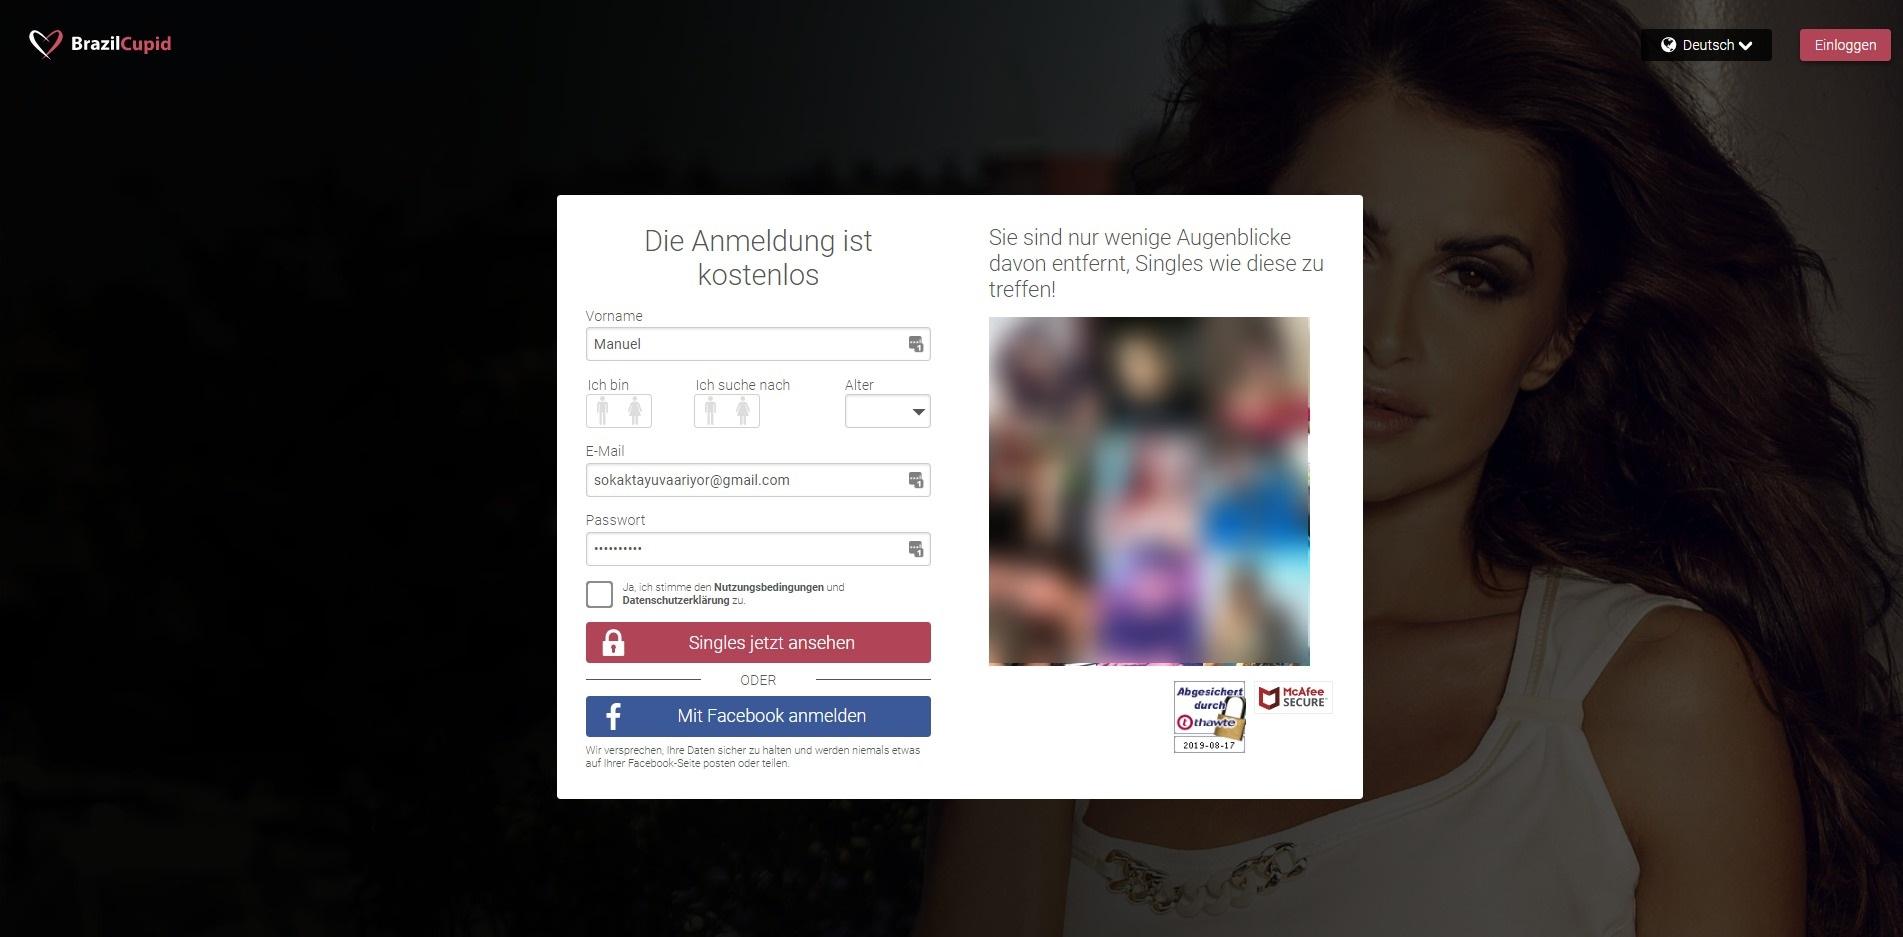 BrazilCupid Anmeldung